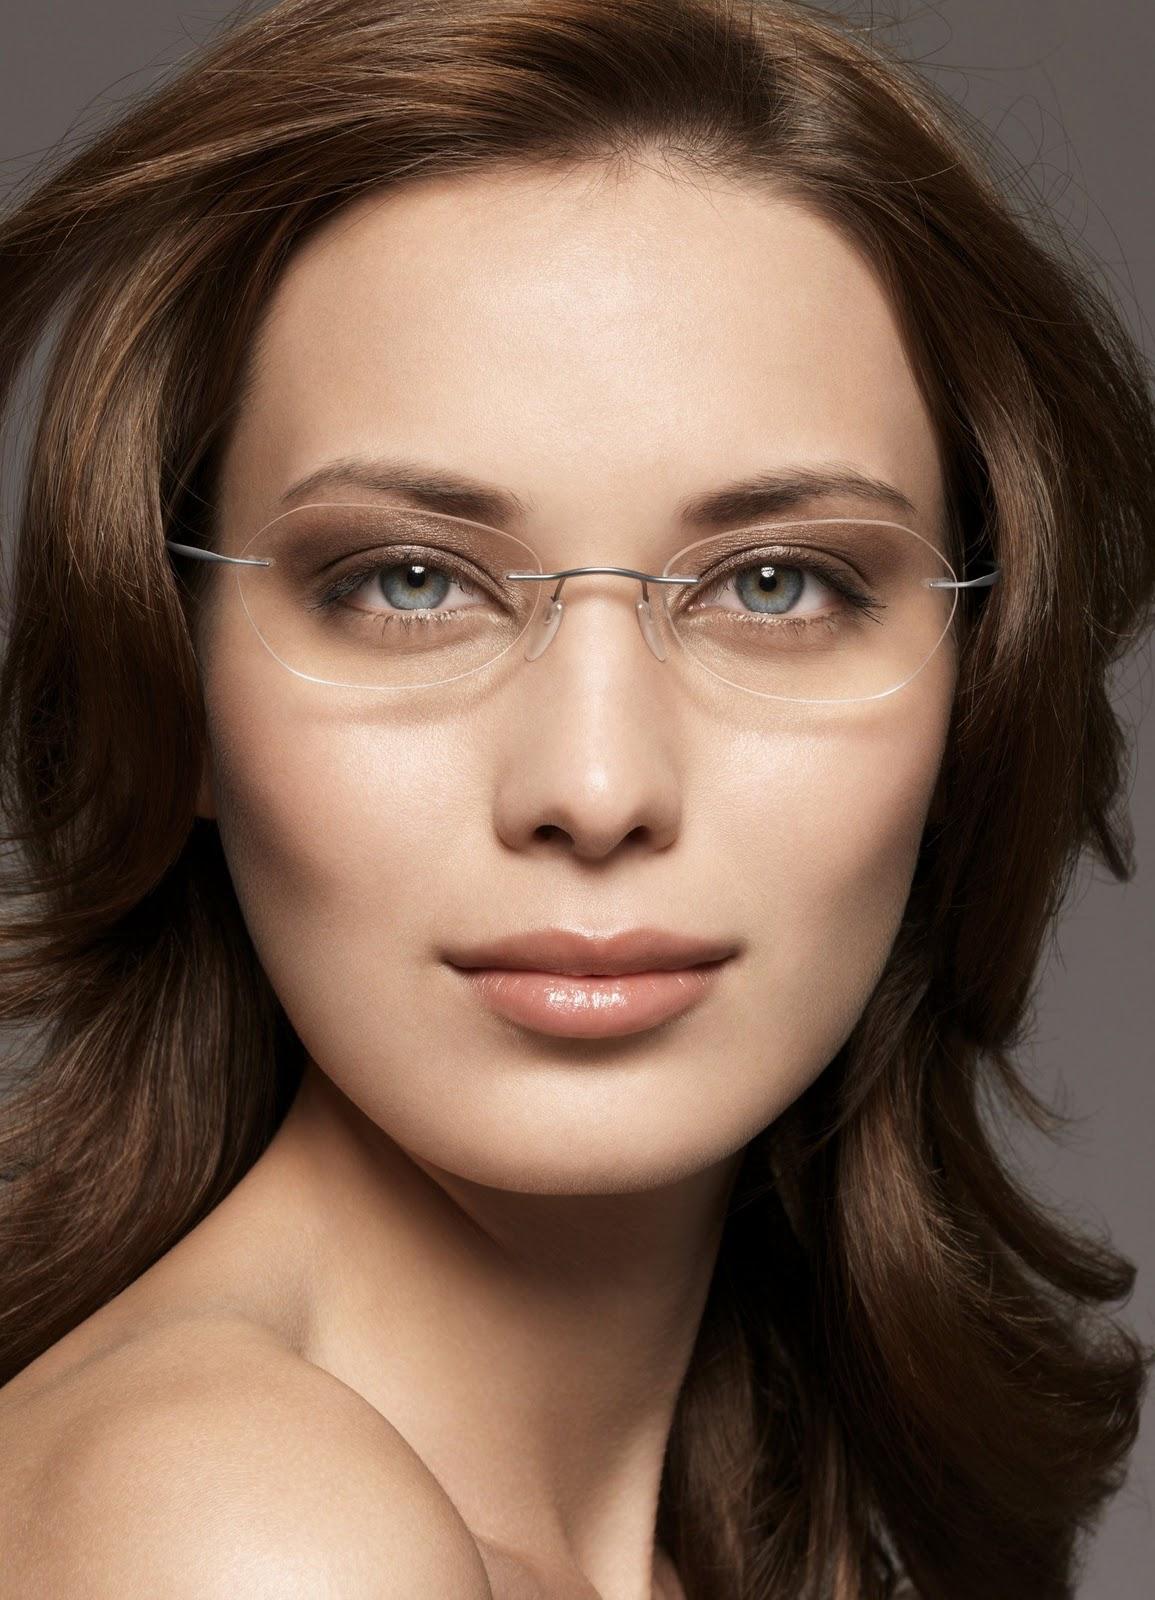 Wearing Glasses HD Wallpapers Set 1